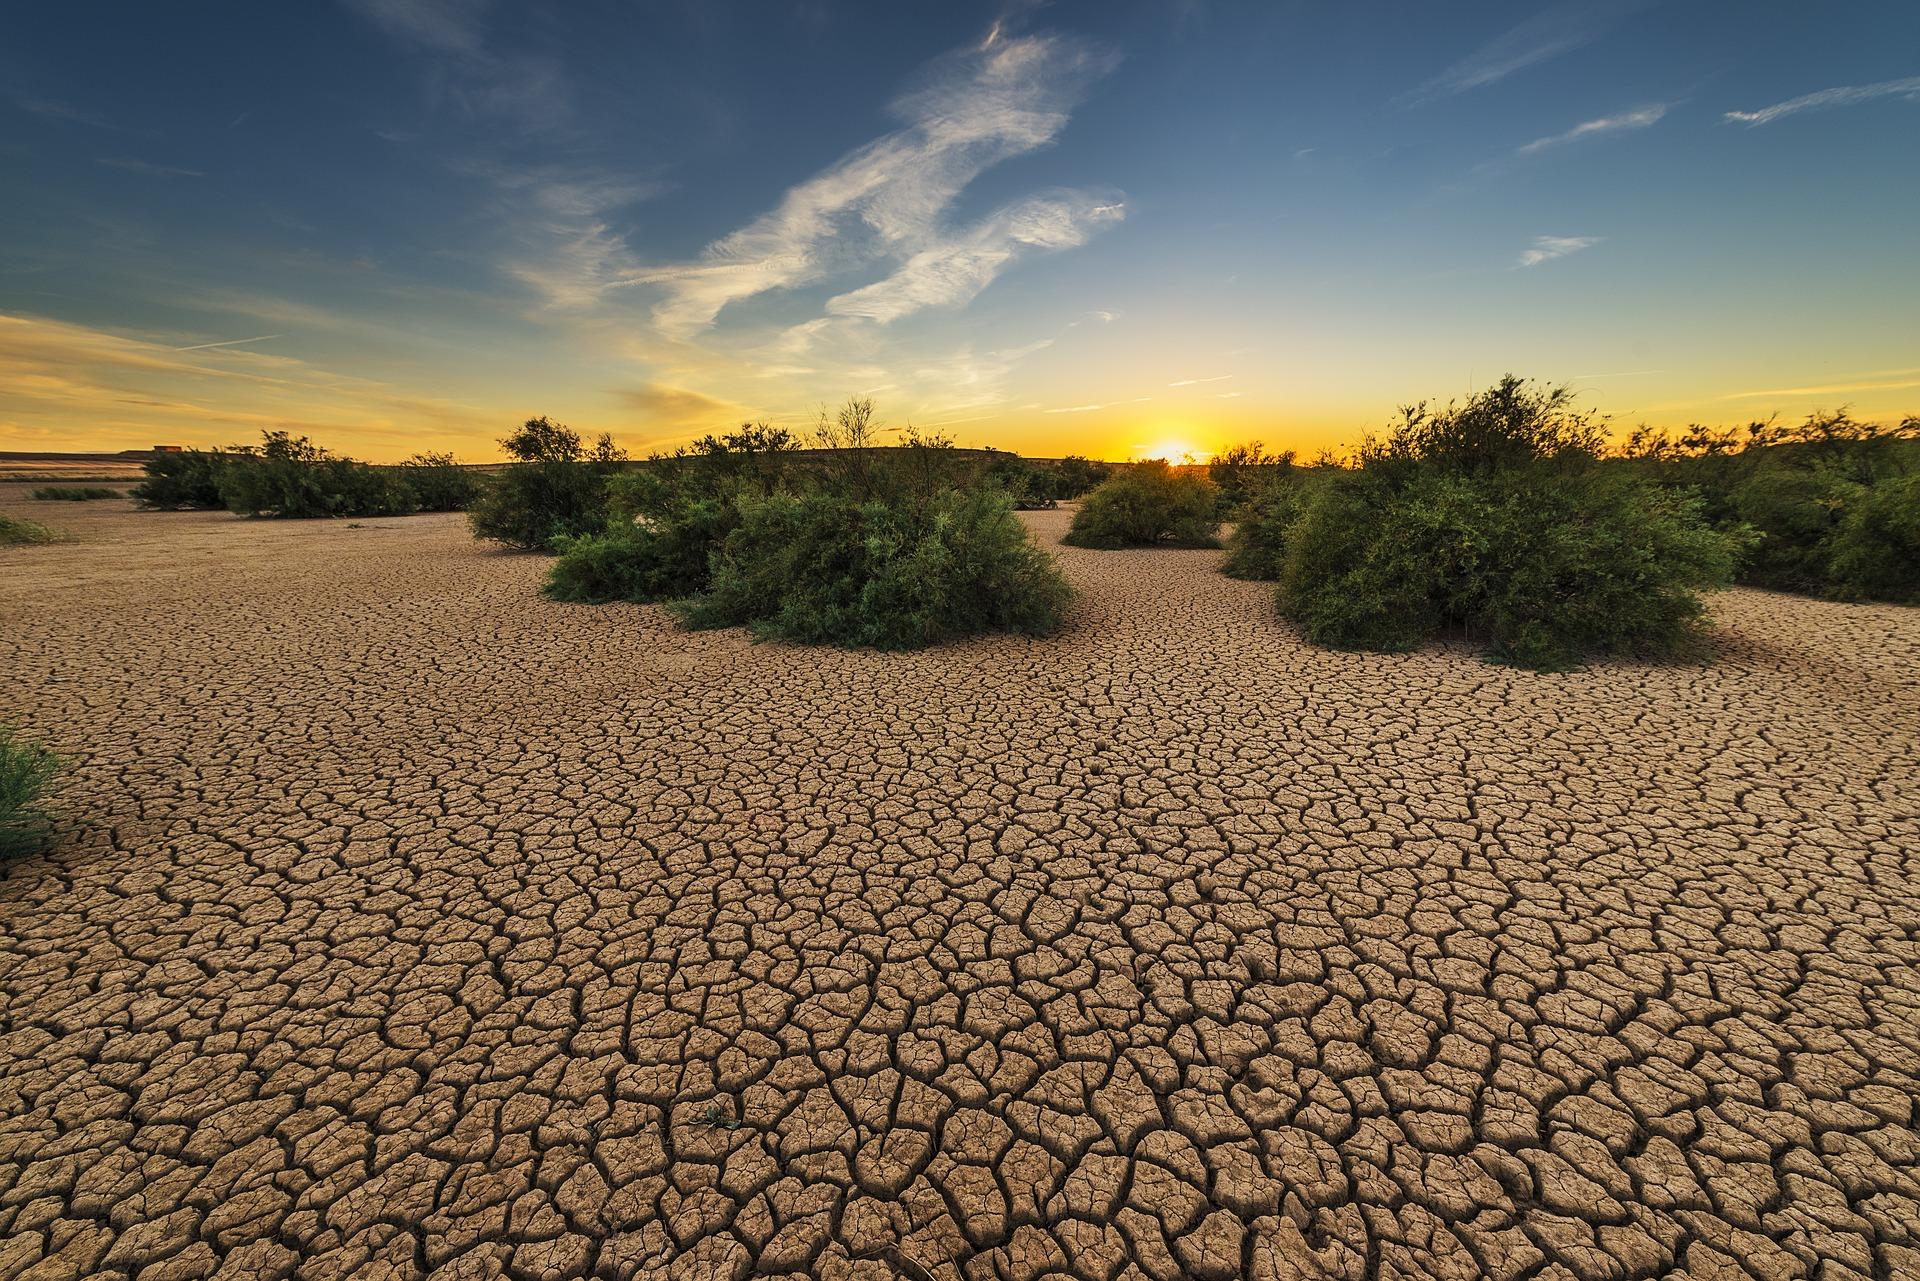 Drought – Psalm 126